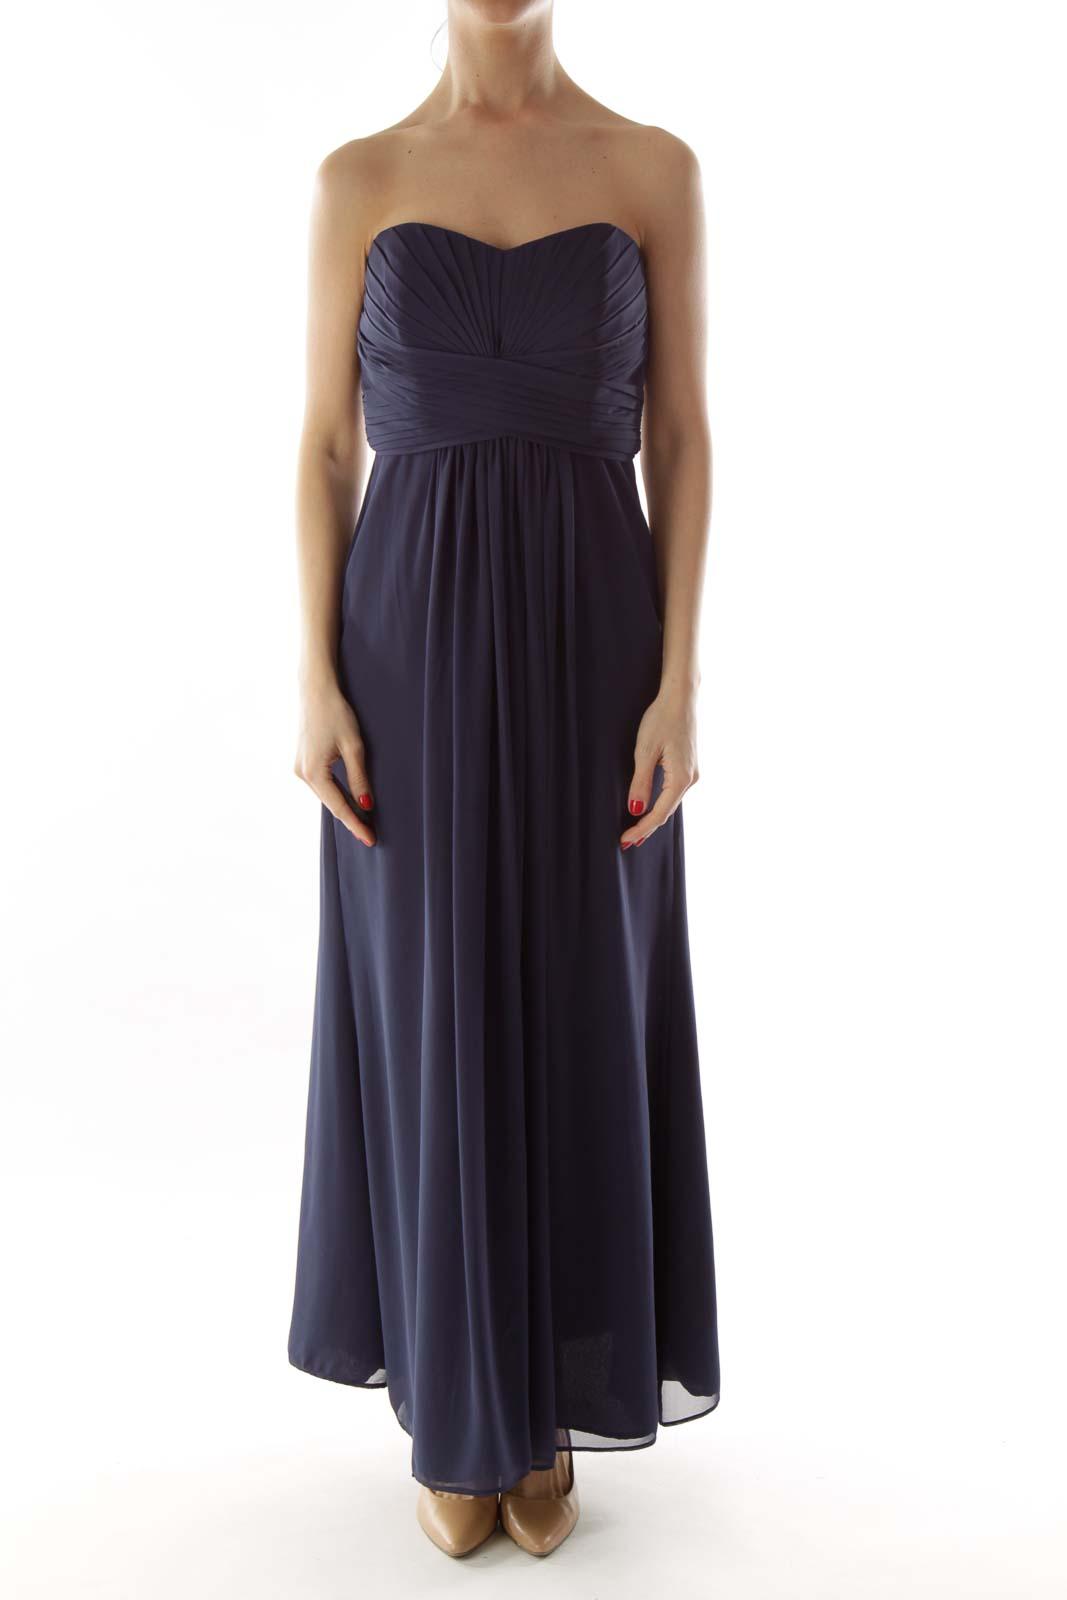 Navy Pleated Strapless Dress f395ed13c4286